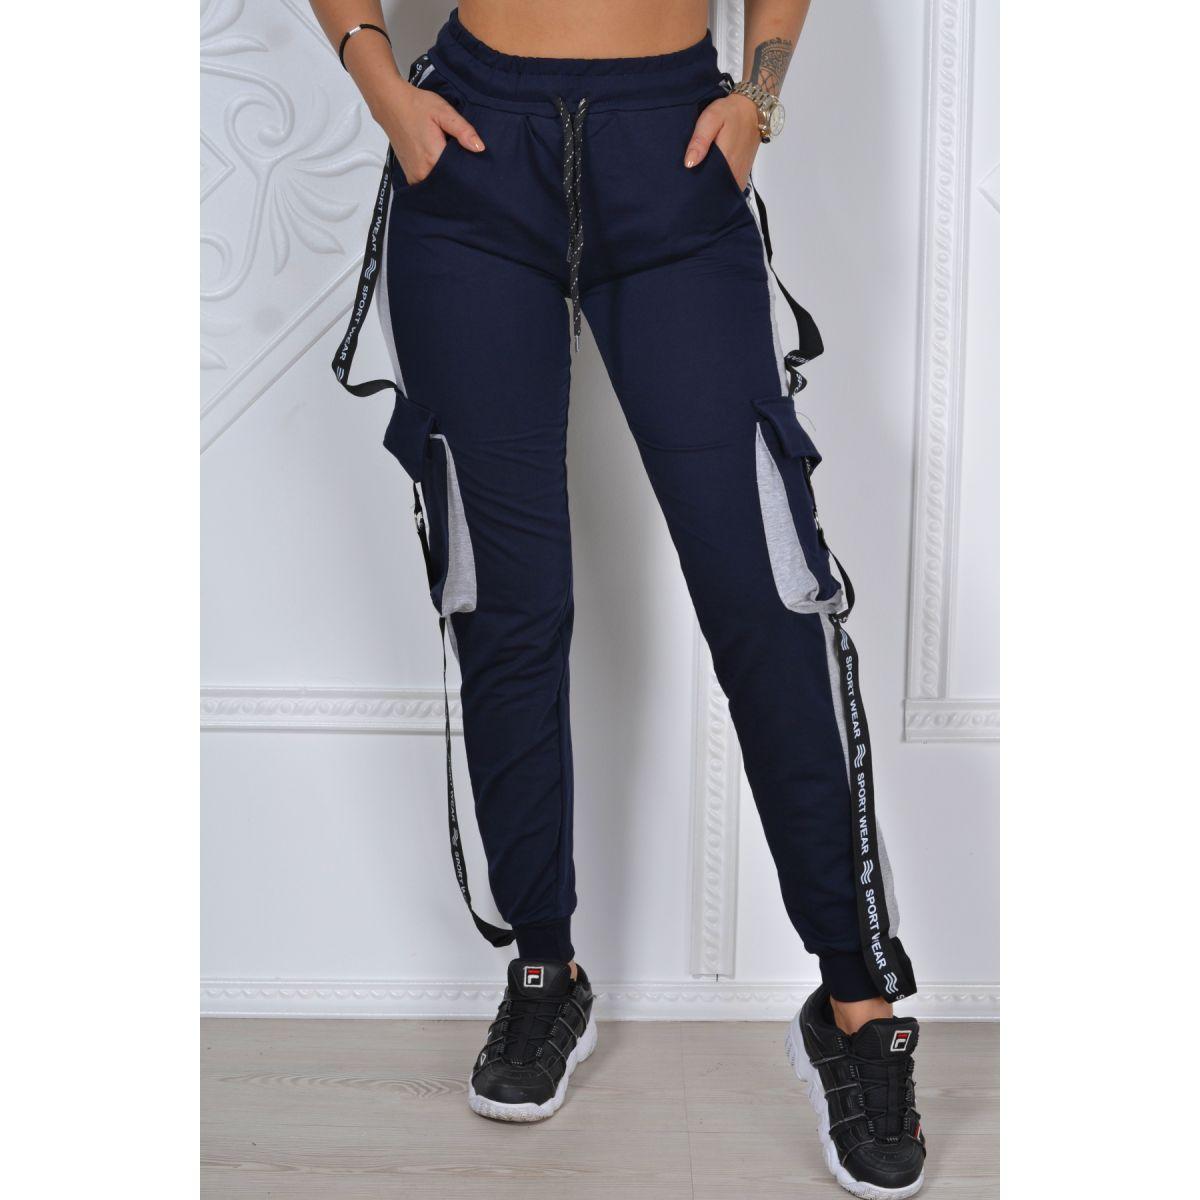 Pantaloni cod : 4941